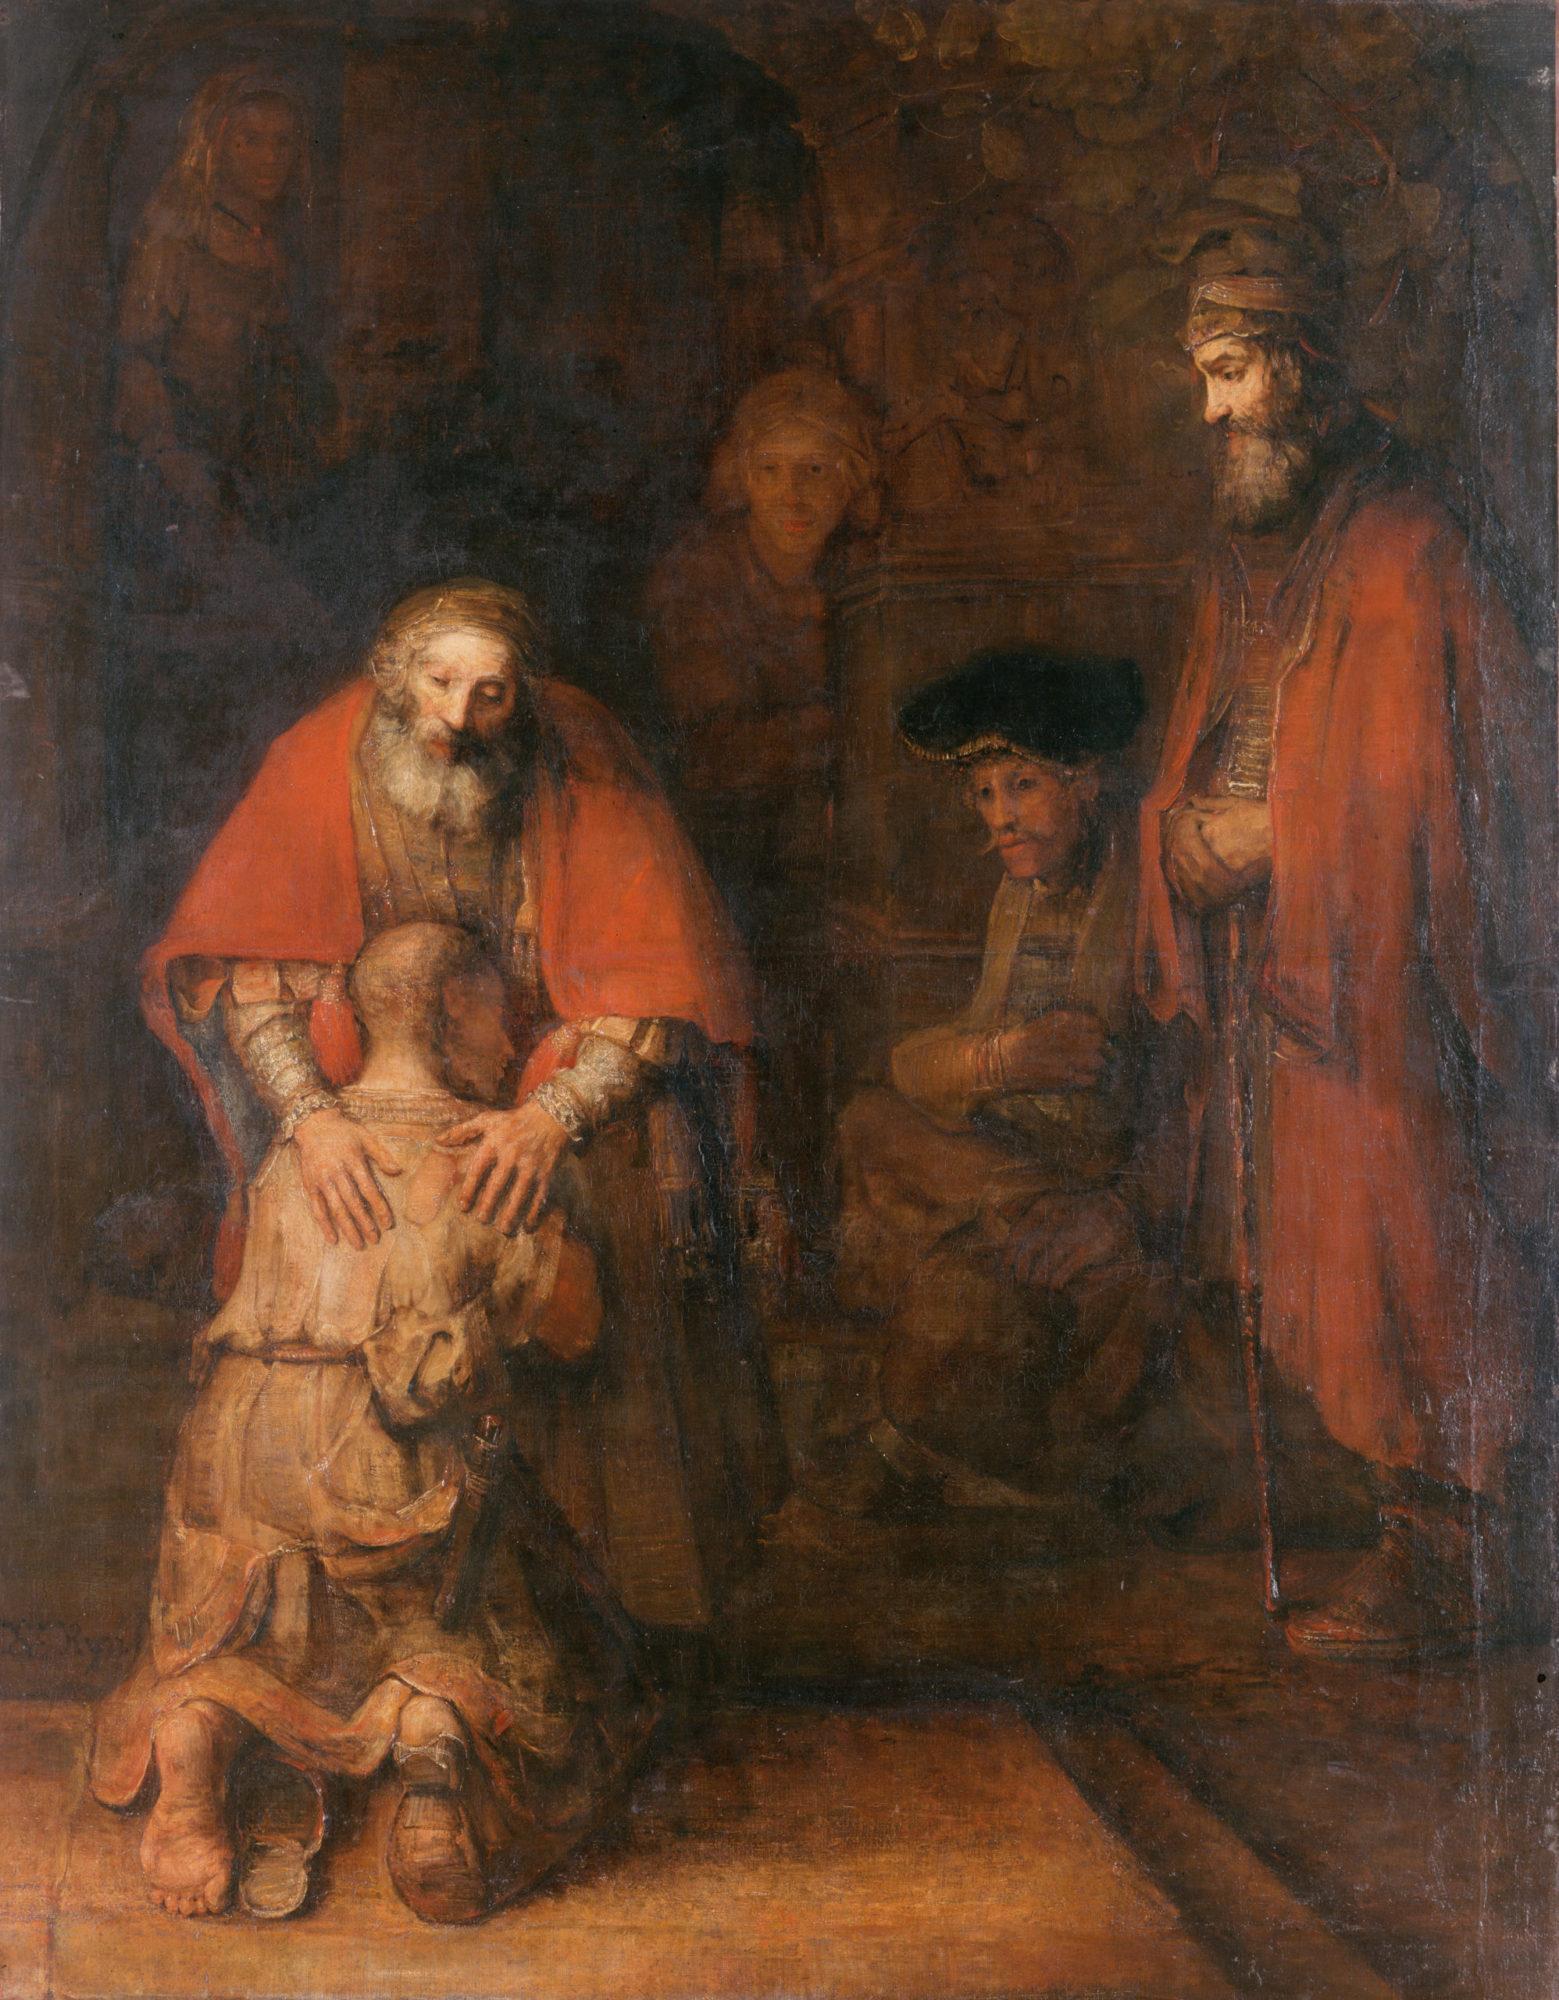 Рембрандт Харменс ван Рейн, 1666 – 1669 гг., картина «Возвращение блудного сына».